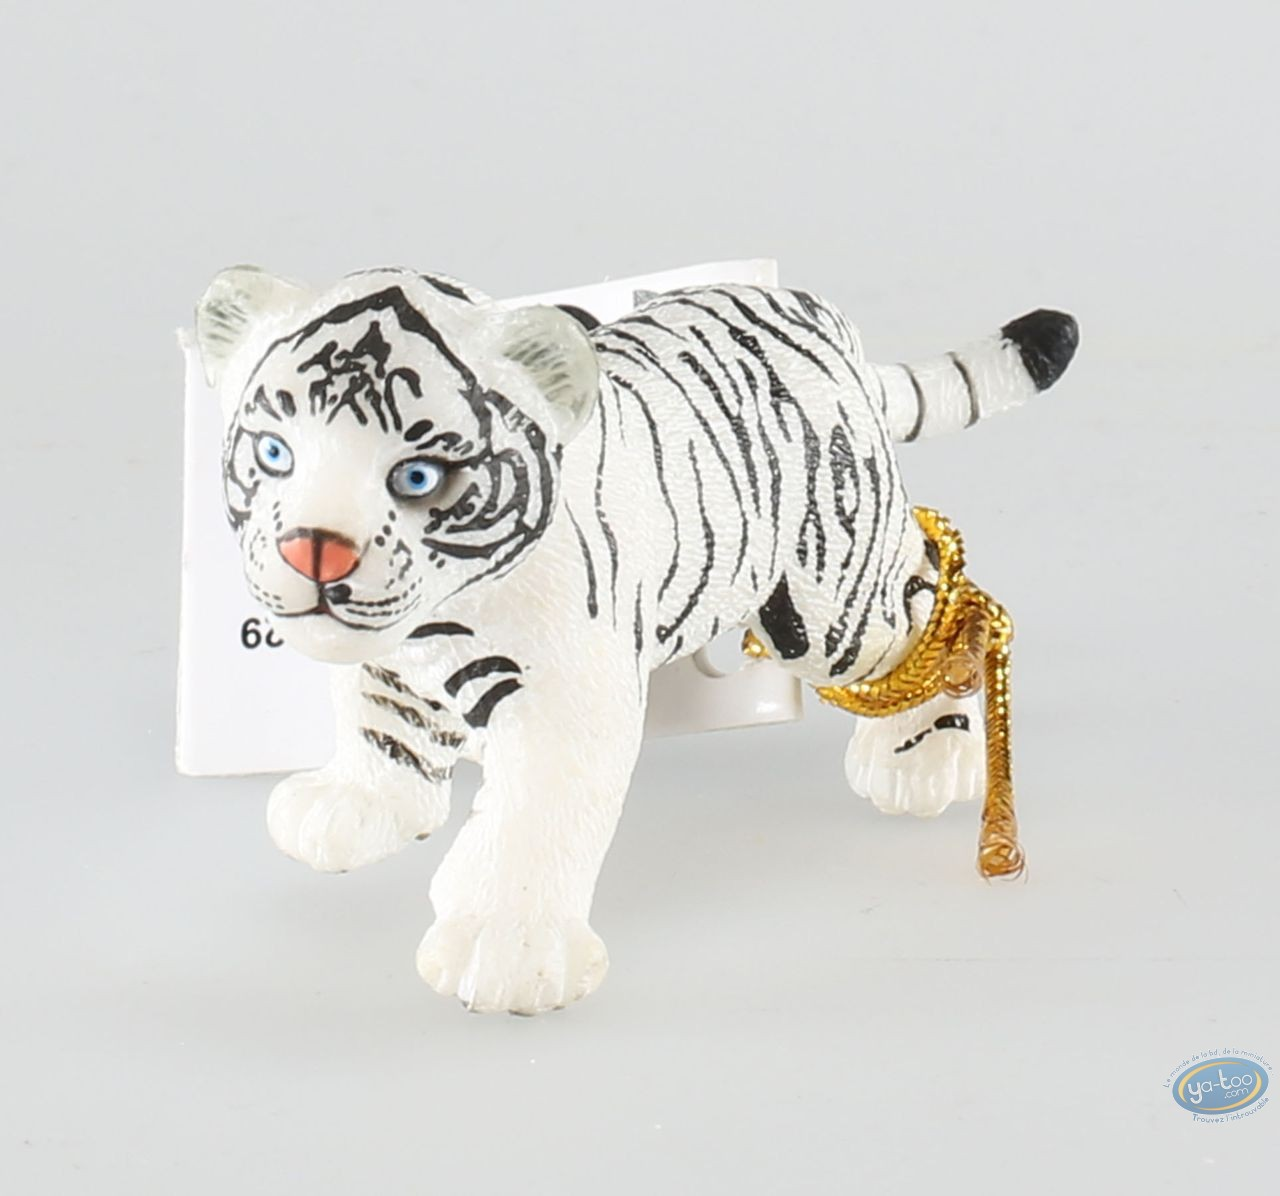 Plastic Figurine, Animaux : White tiger cub